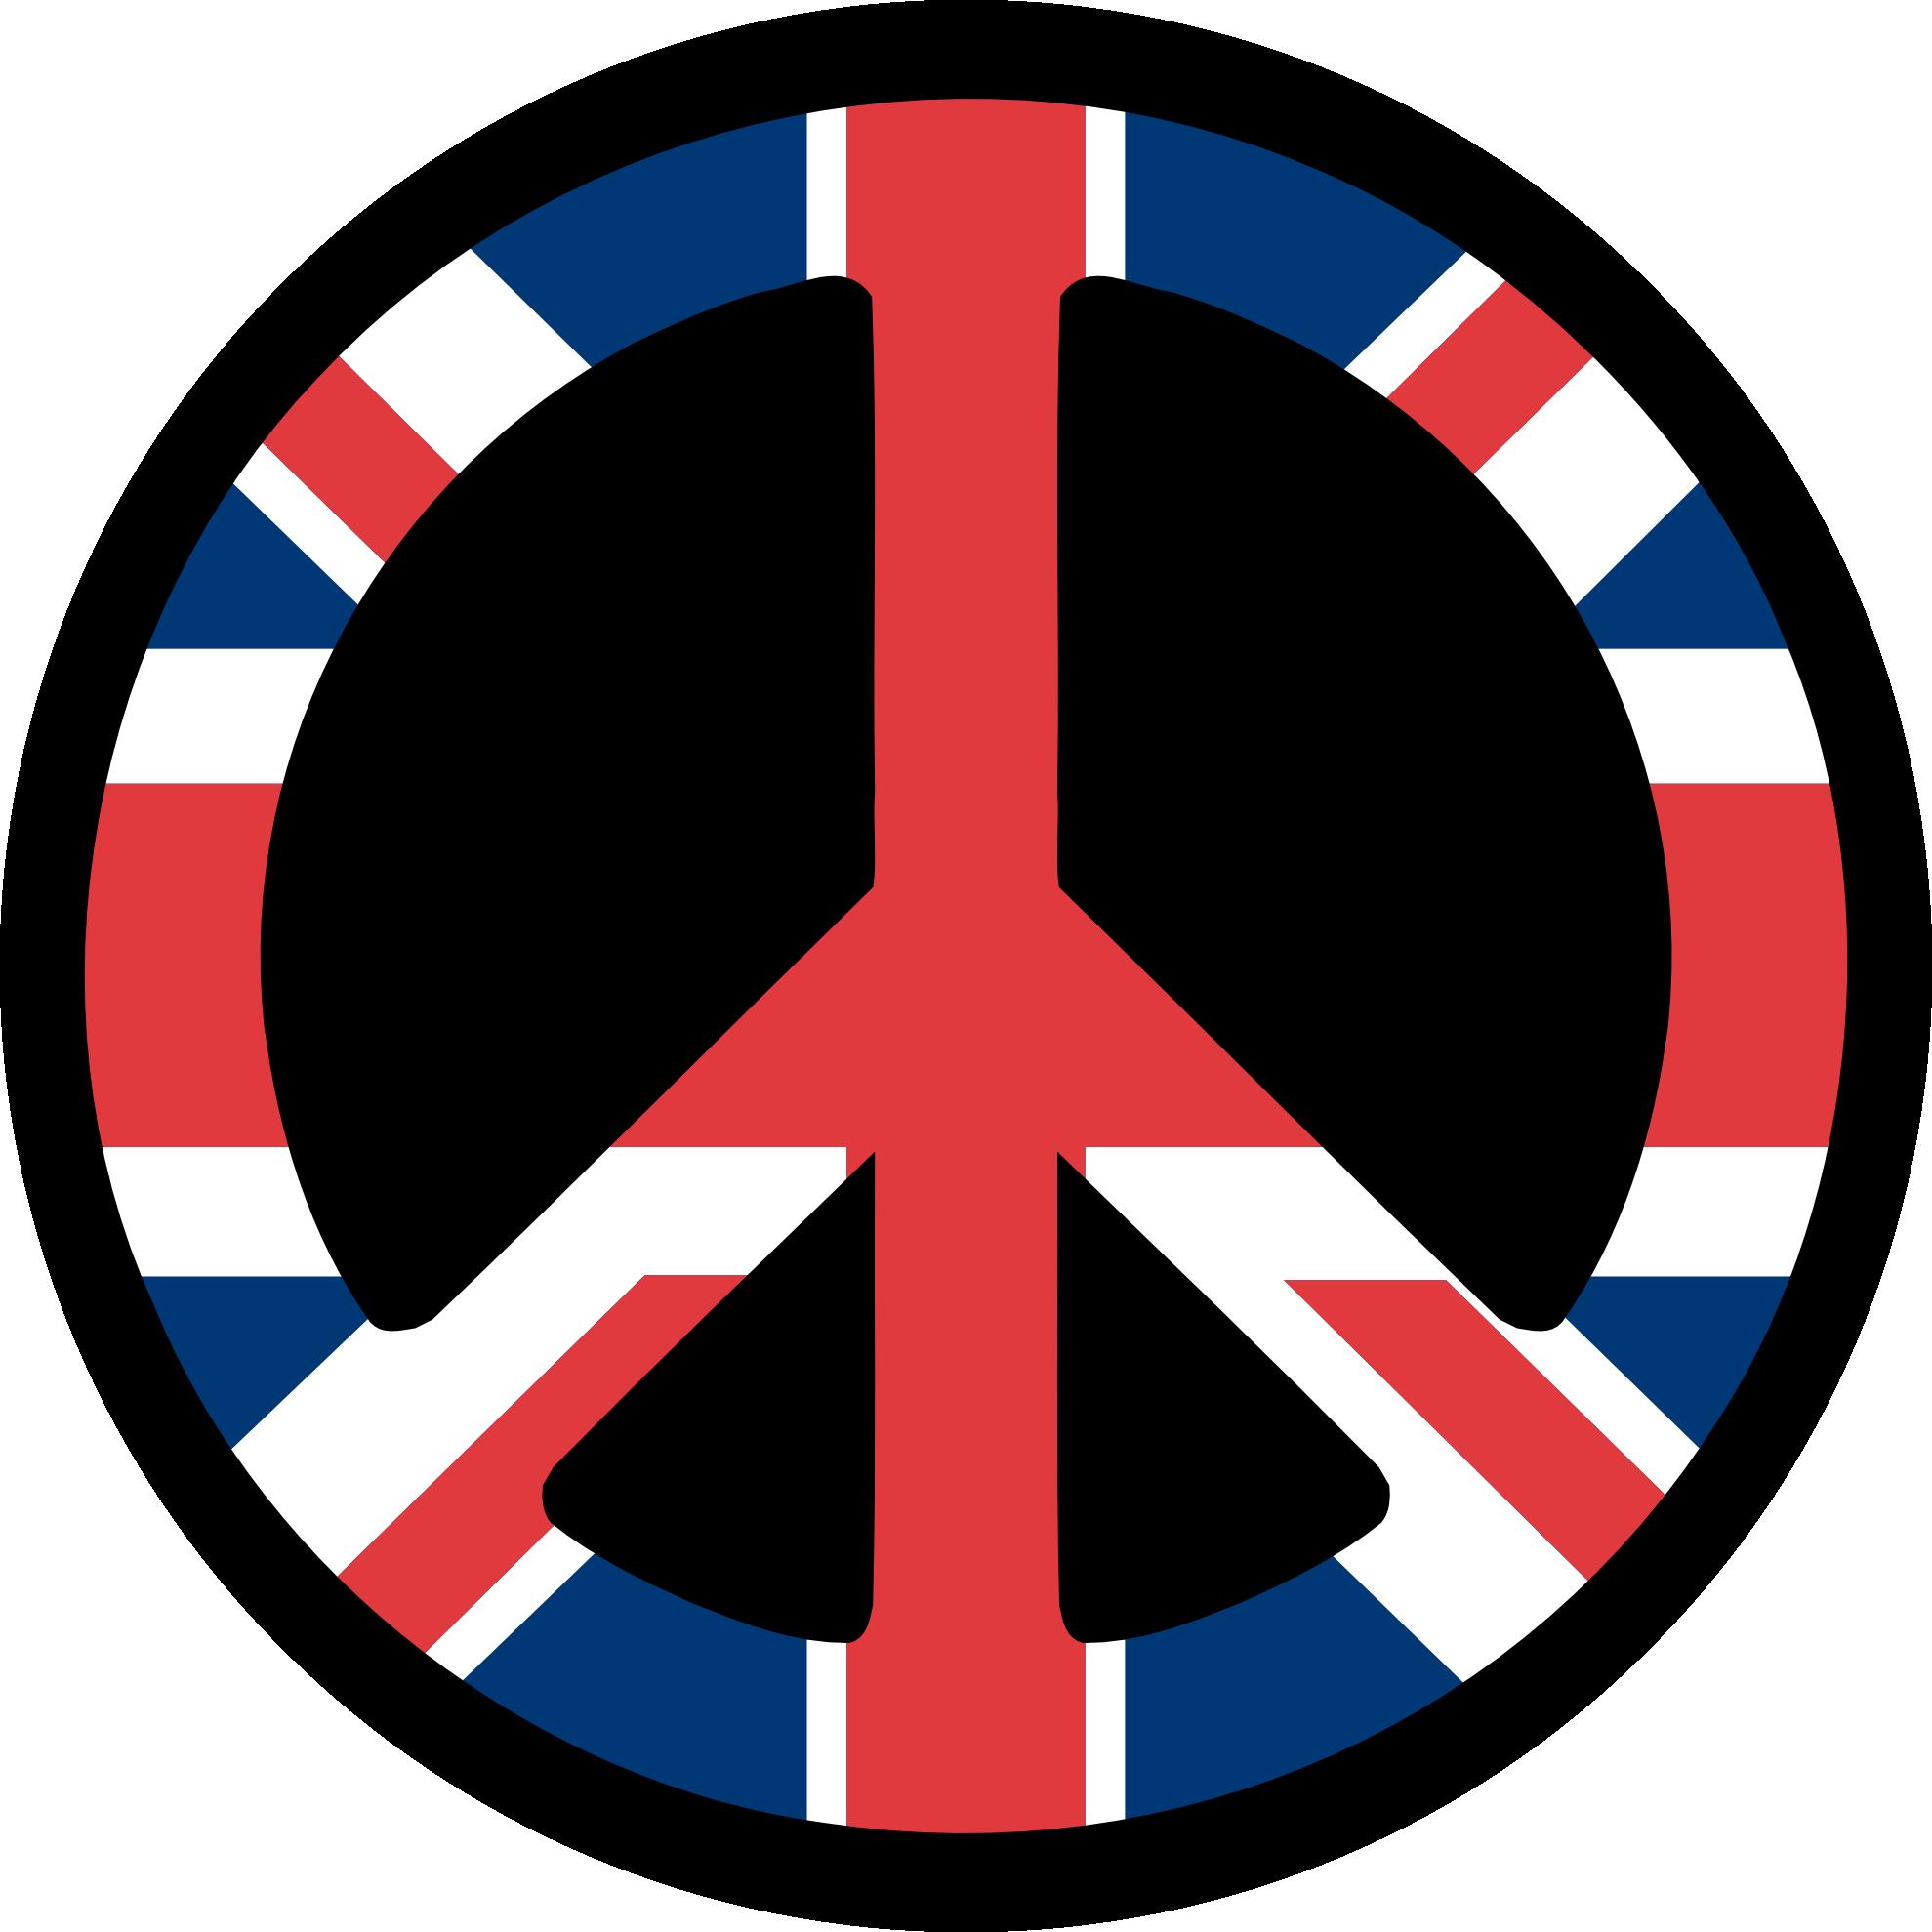 1979x1979 Clip Art Flag Art Uk Flag Peace Symbol Fav Wall